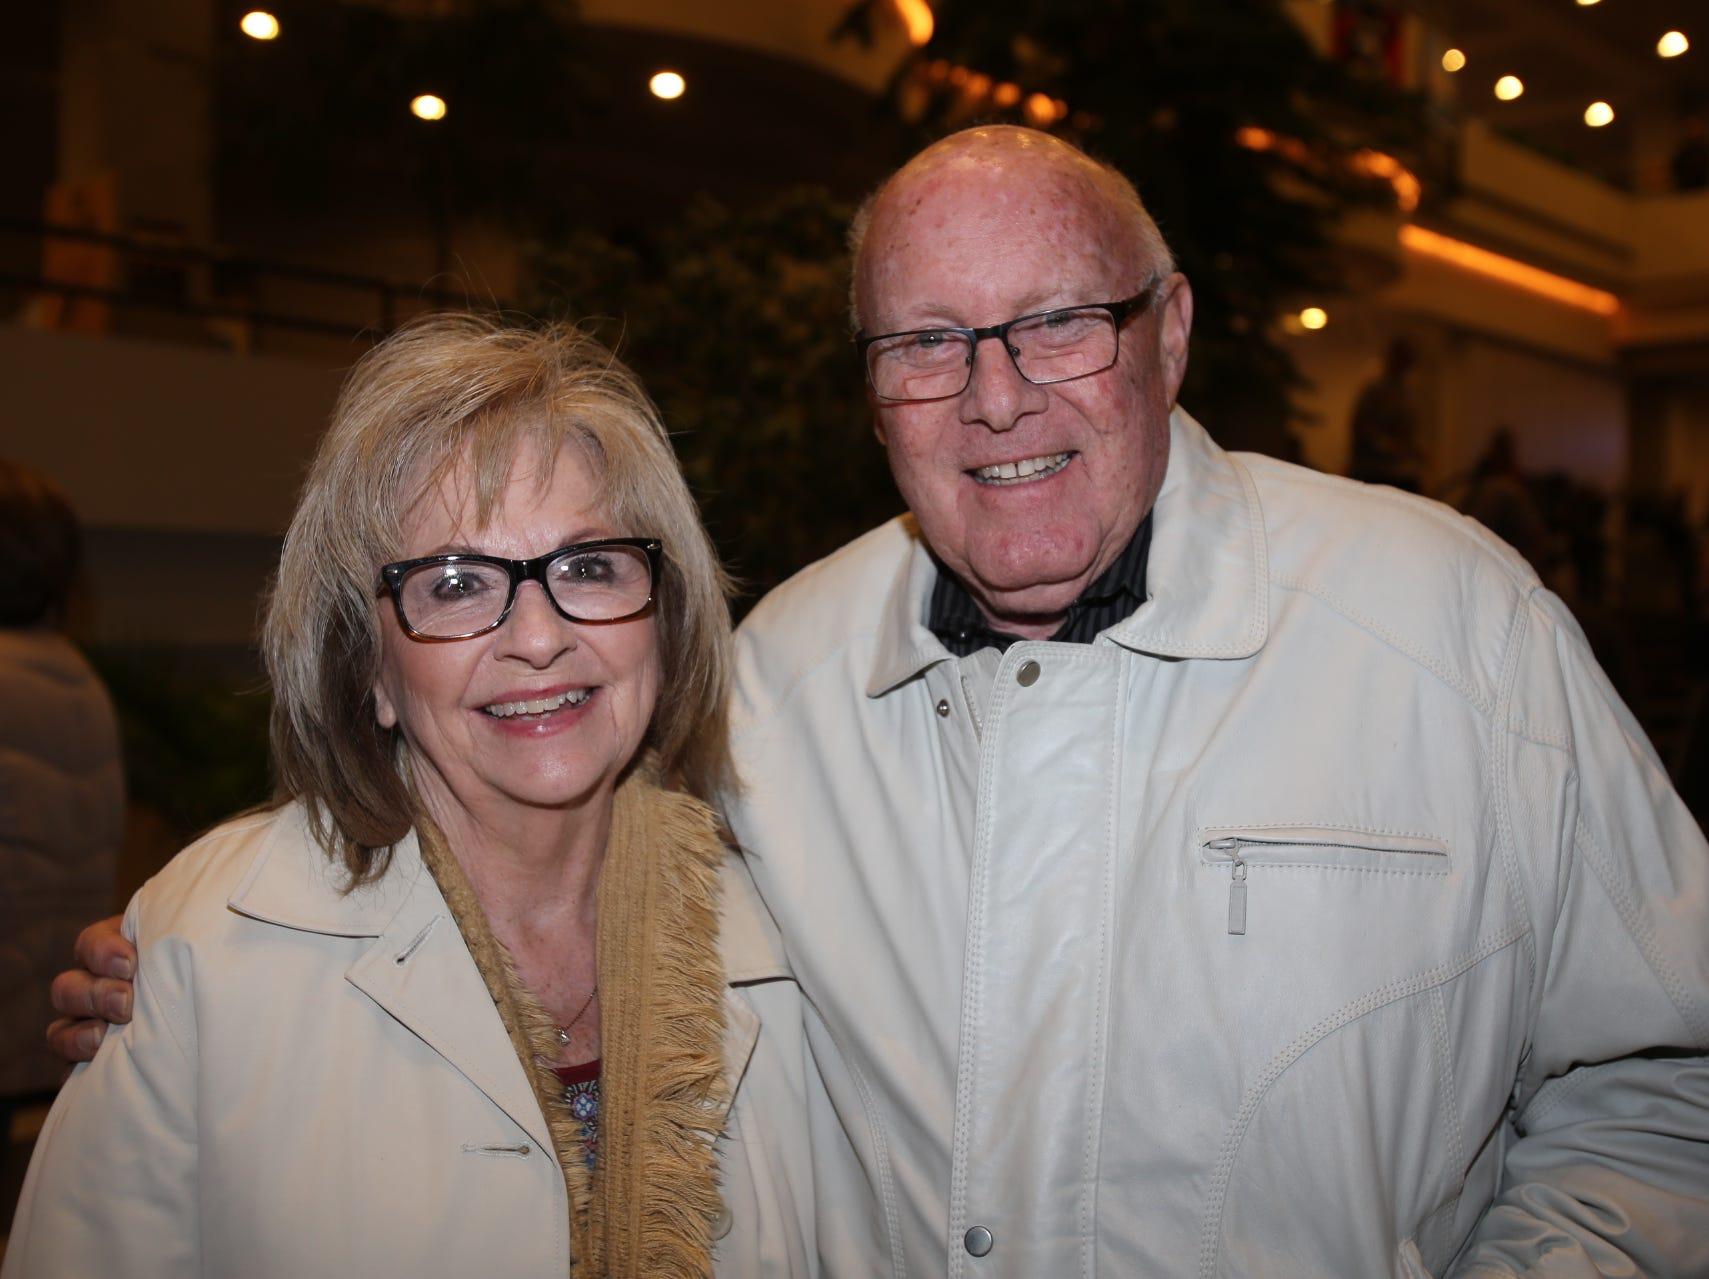 Karen and Jim Latimer